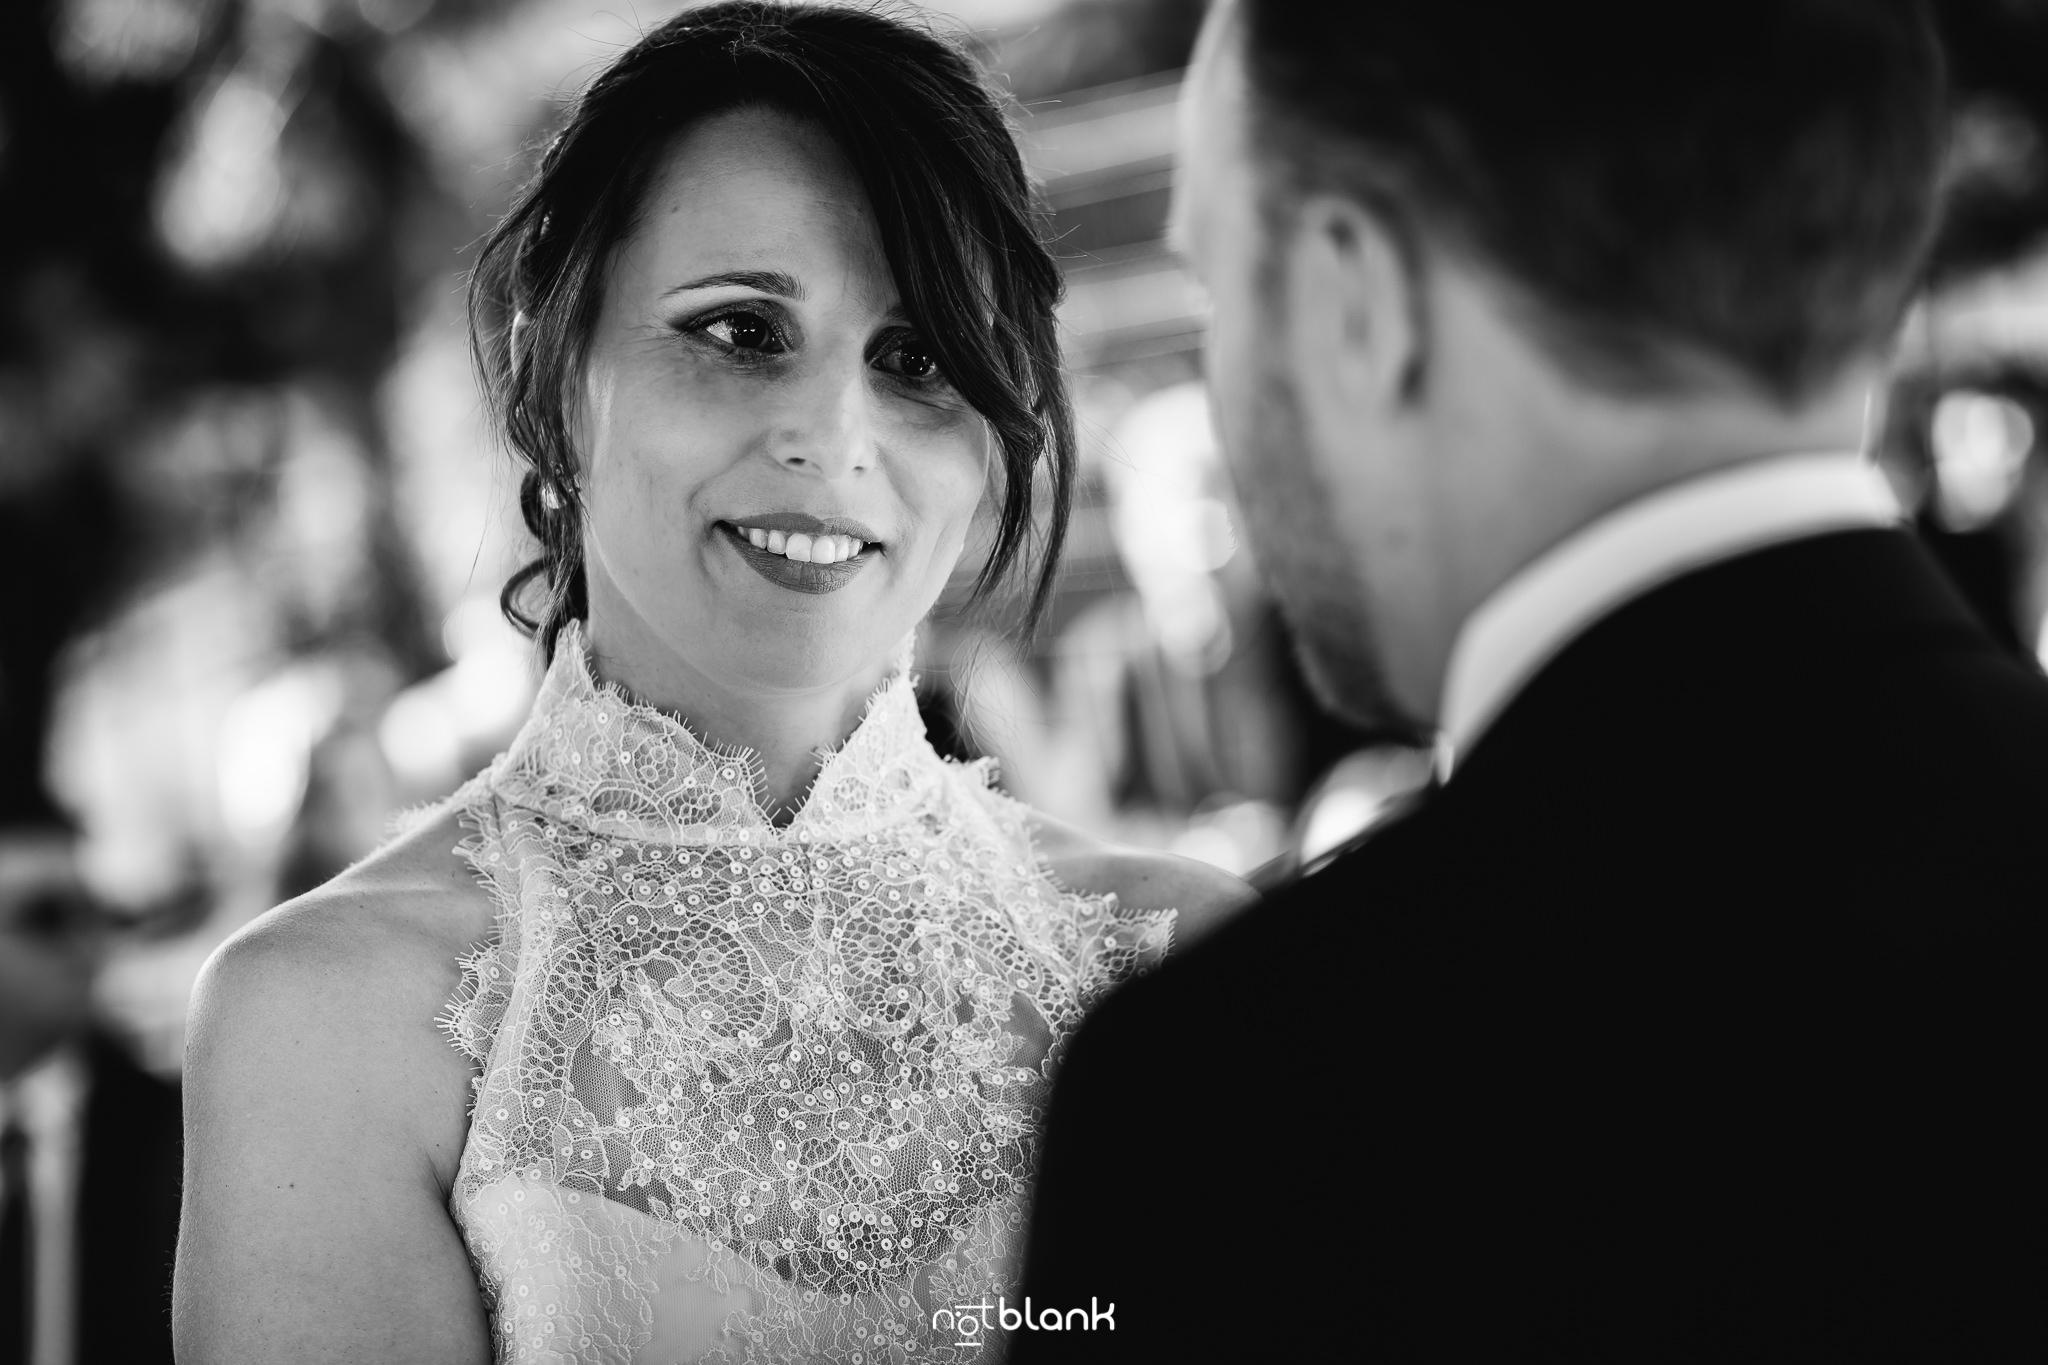 Boda-Maite-David-Novia-Sonrie-En-Altar-Ceremonia-Civil-Talaso-Atlantico. Reportaje realizado por Notblank fotógrafos de boda